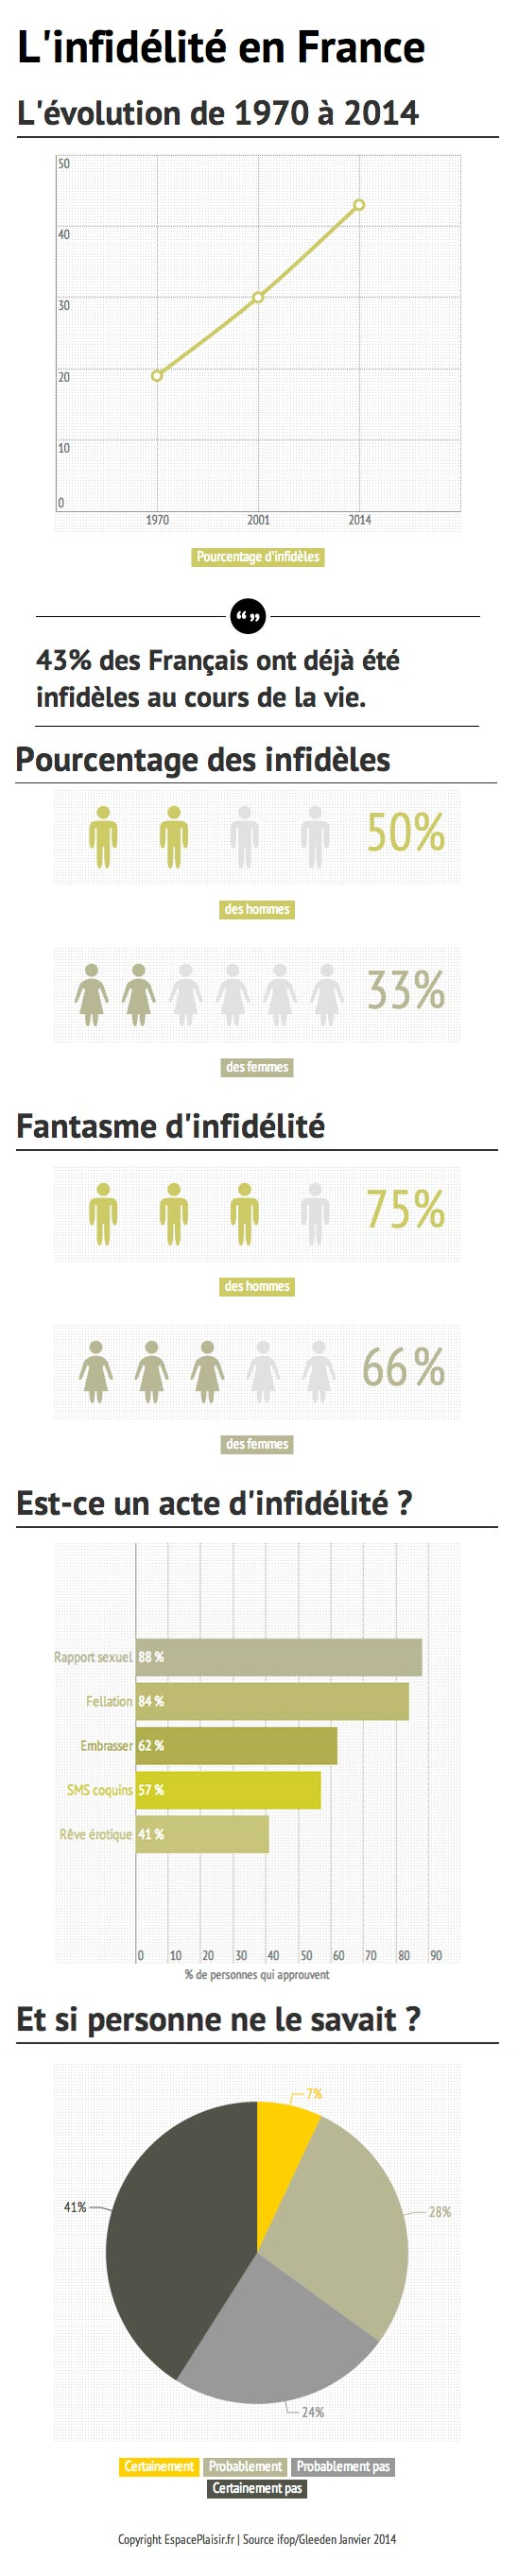 infographie-infidélité